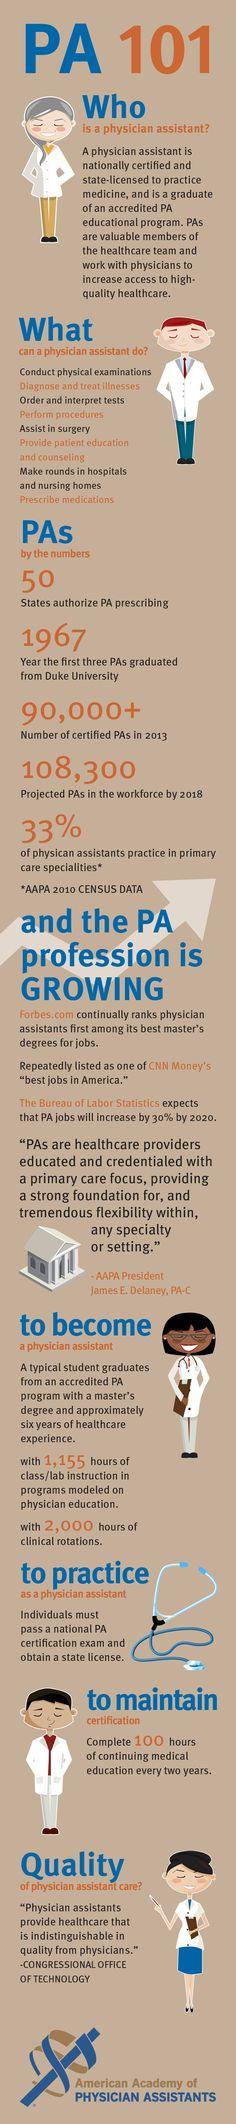 Medical Assistant Tips Career Pa School 52 Super Ideas Physician Assistant School, Medical Assistant, Future Jobs, Future Career, Pa School, Medical School, Pa Career, Pa Life, Medical Field